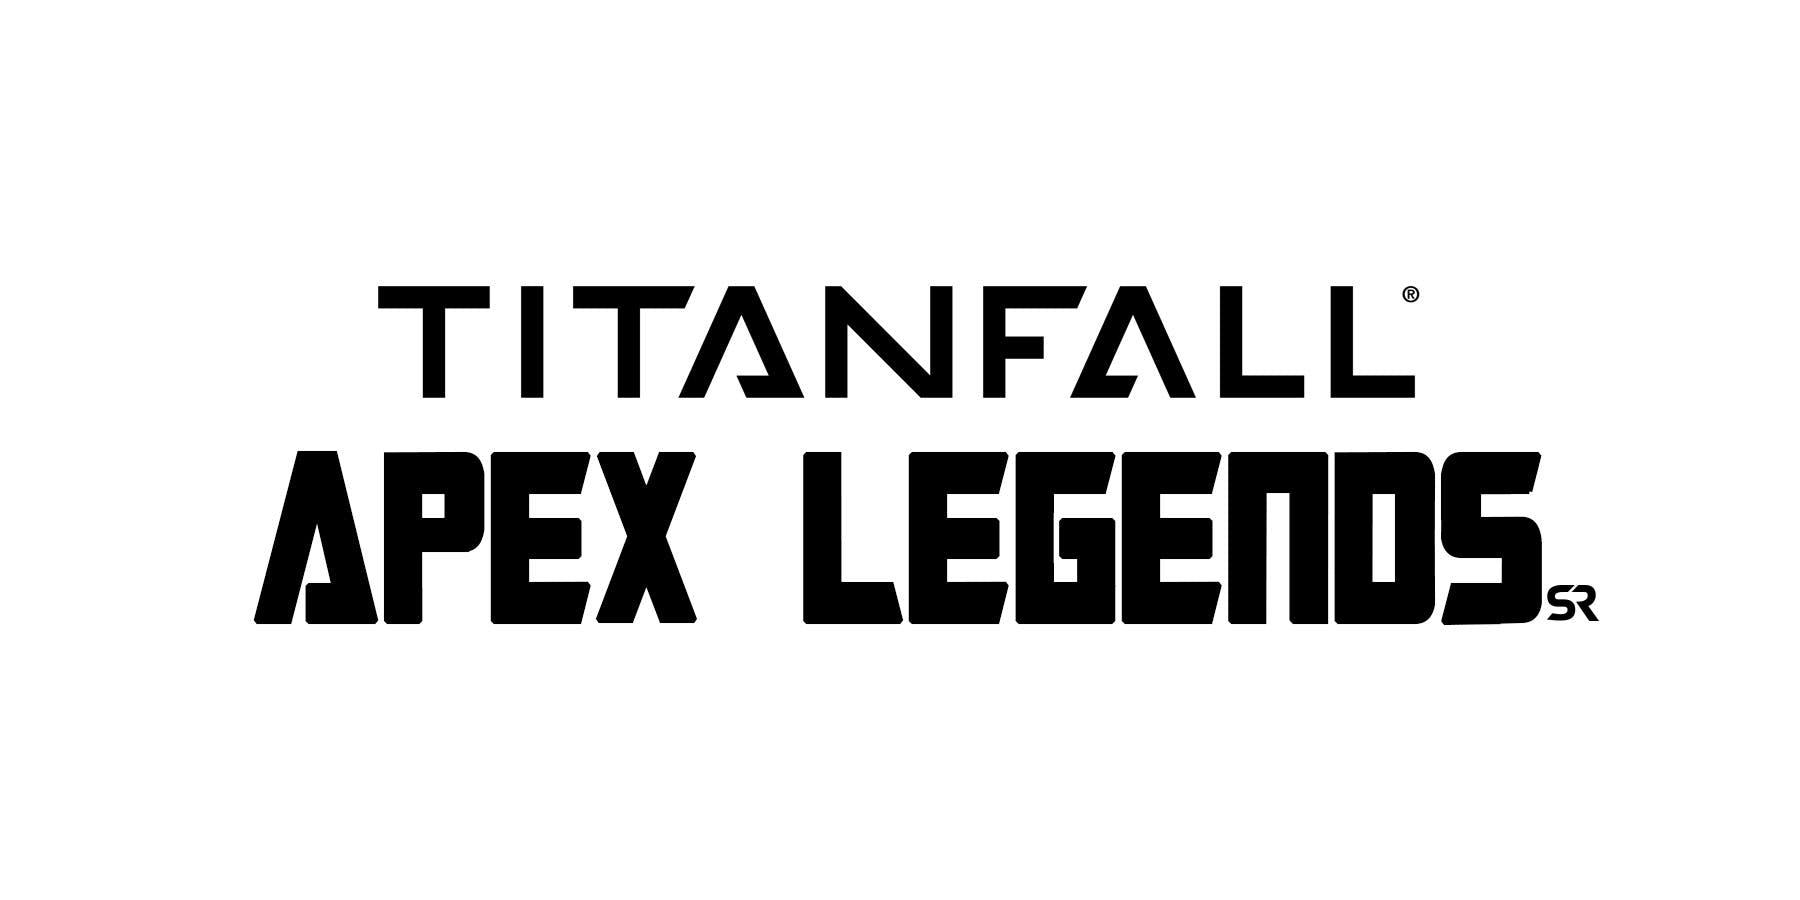 Titanfall Apex Legend